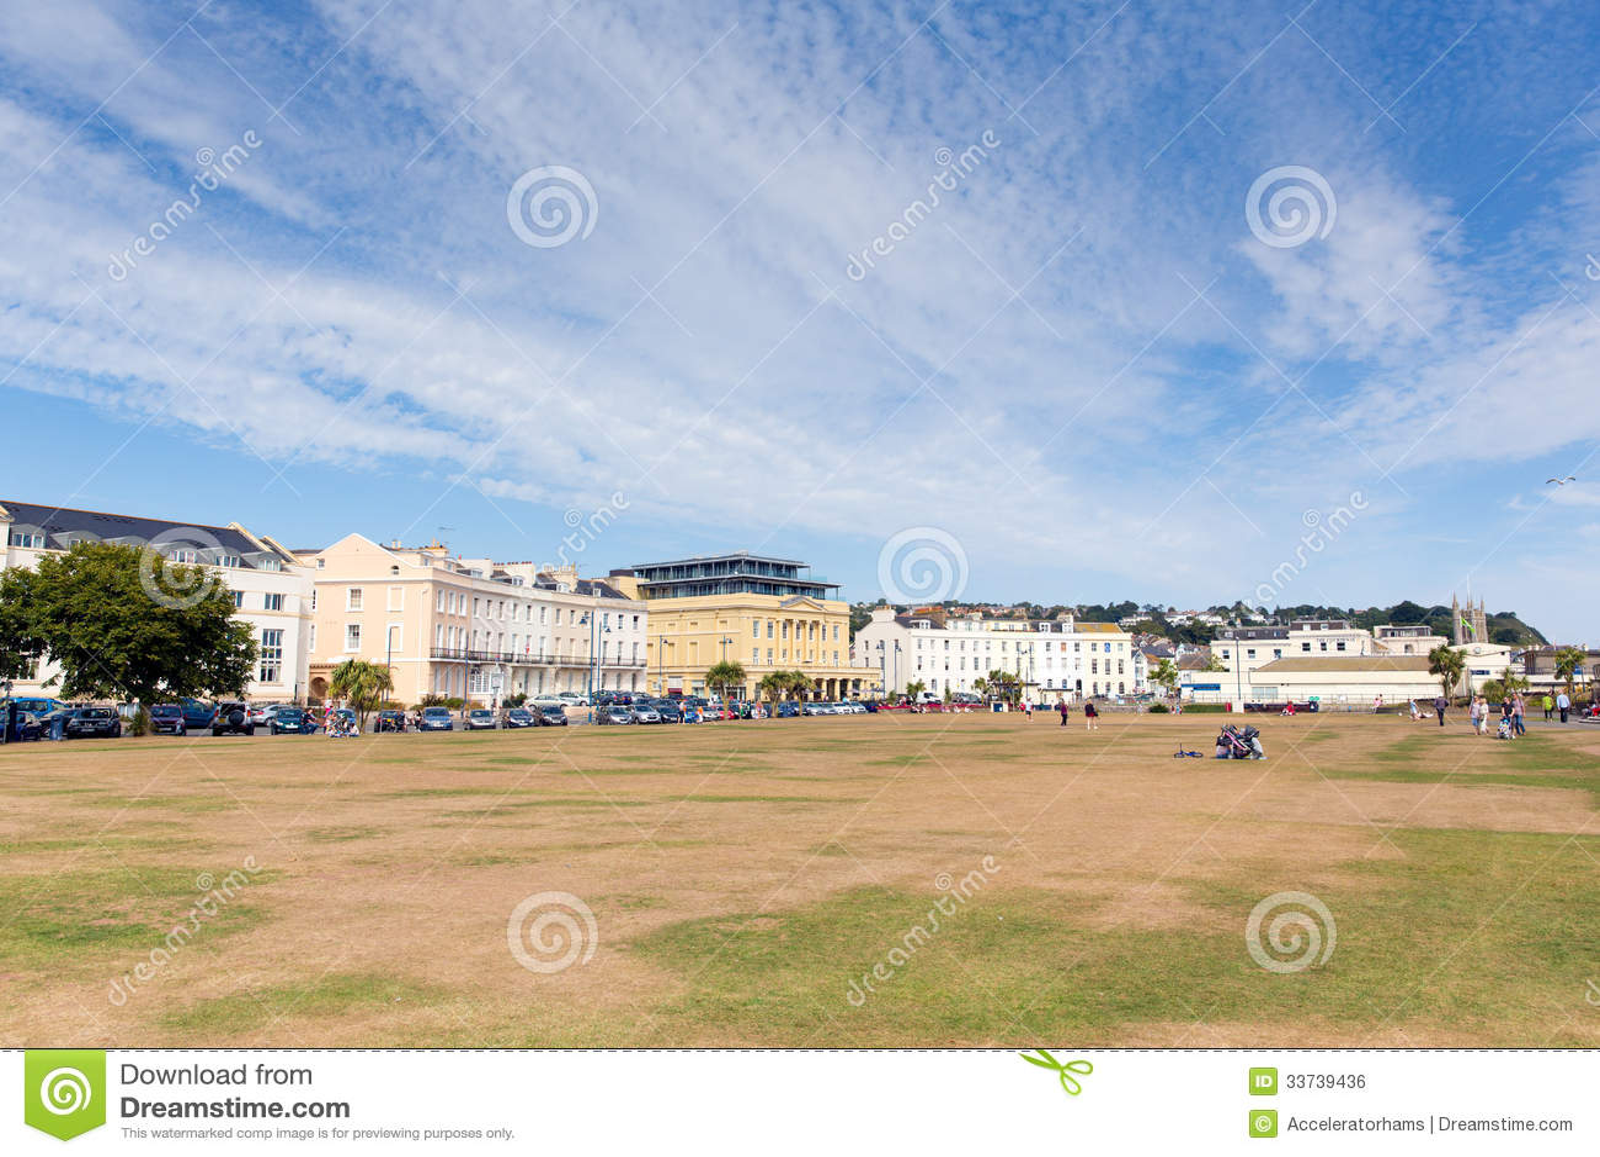 Лужайки пляжа Teignmouth Девона на набережной